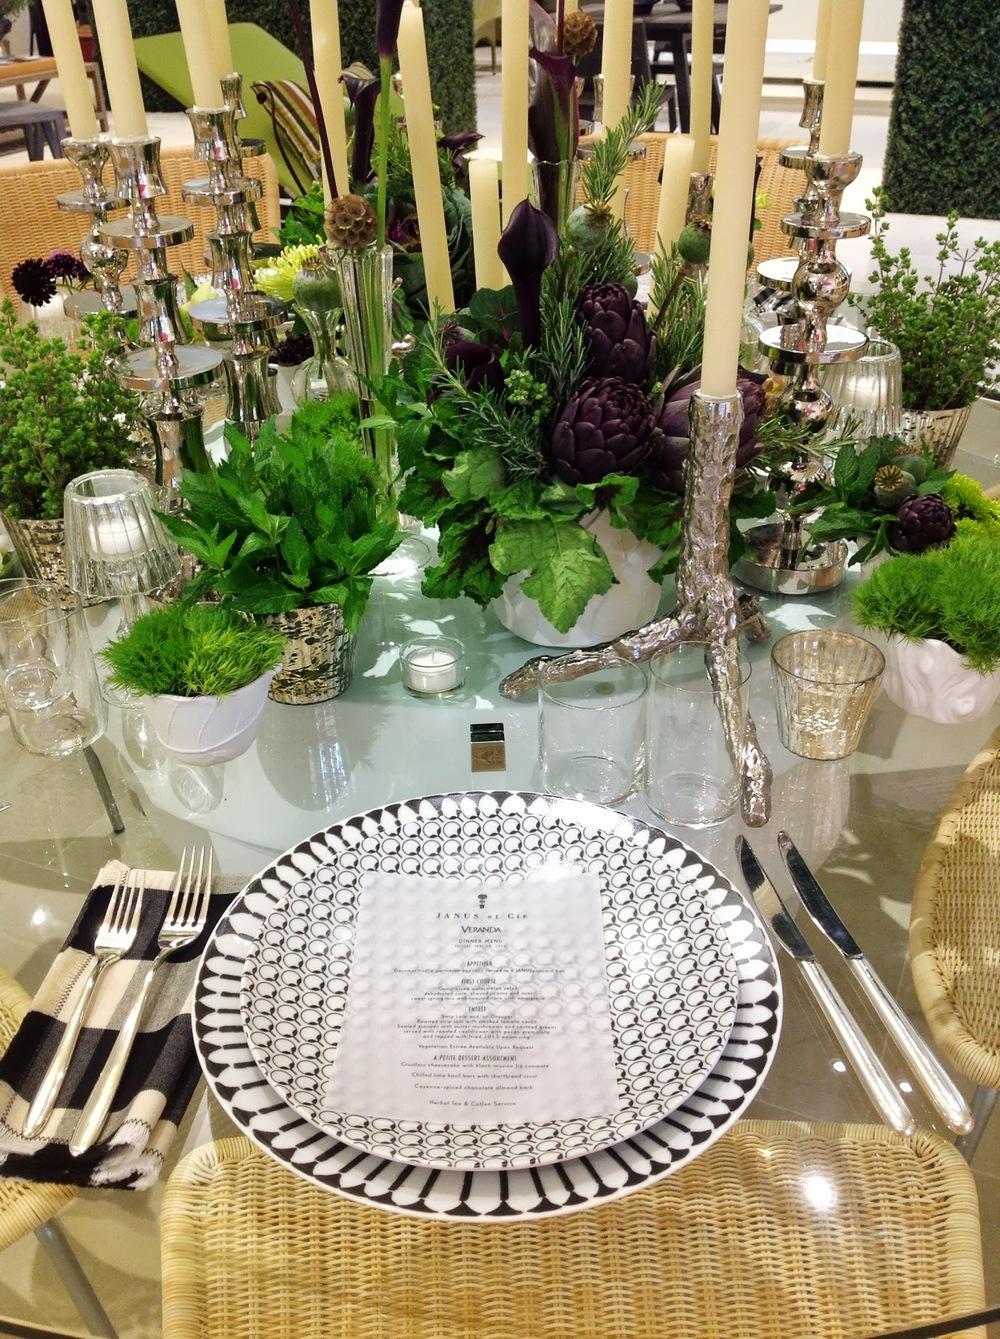 Launch Party- JANUS et Cie Modern Table Arrangement by Maxit Flower Design in Houston, Texas